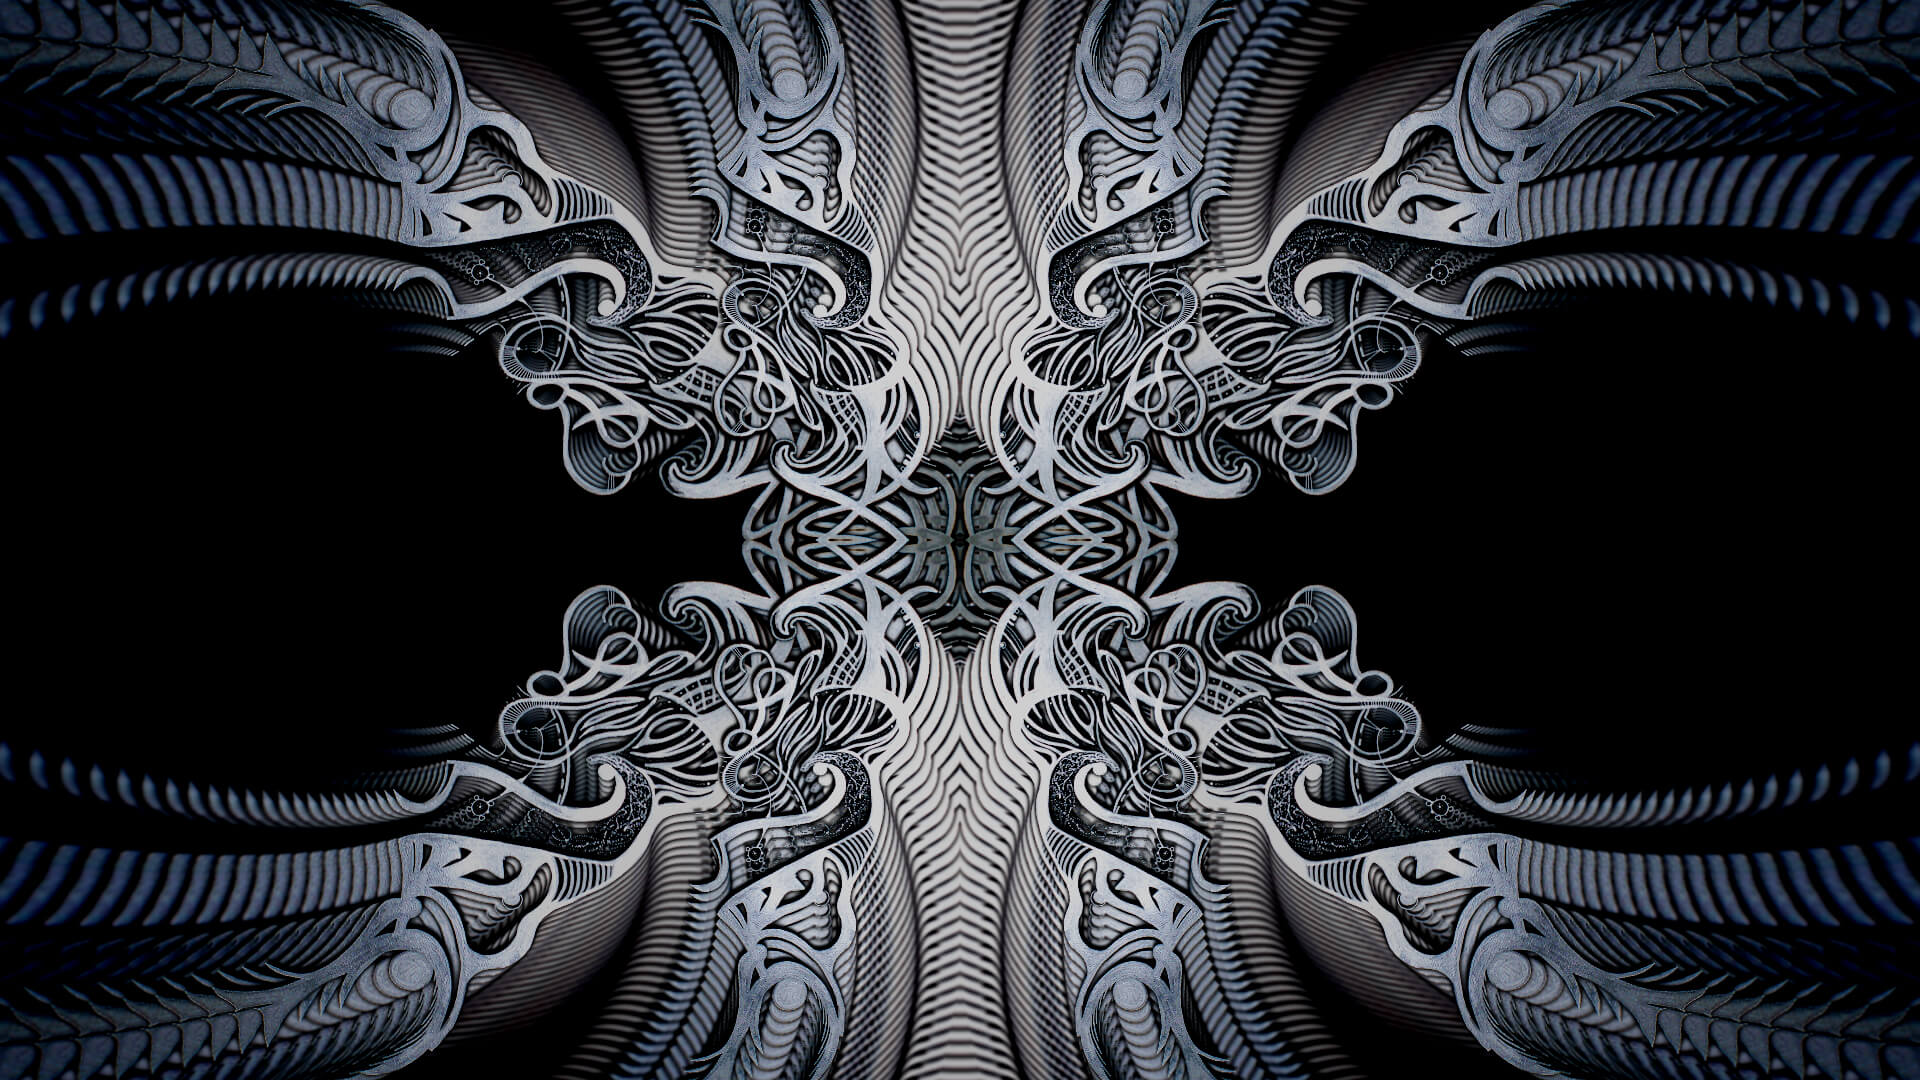 Clash of bright metal - digital abstract art by Mitek